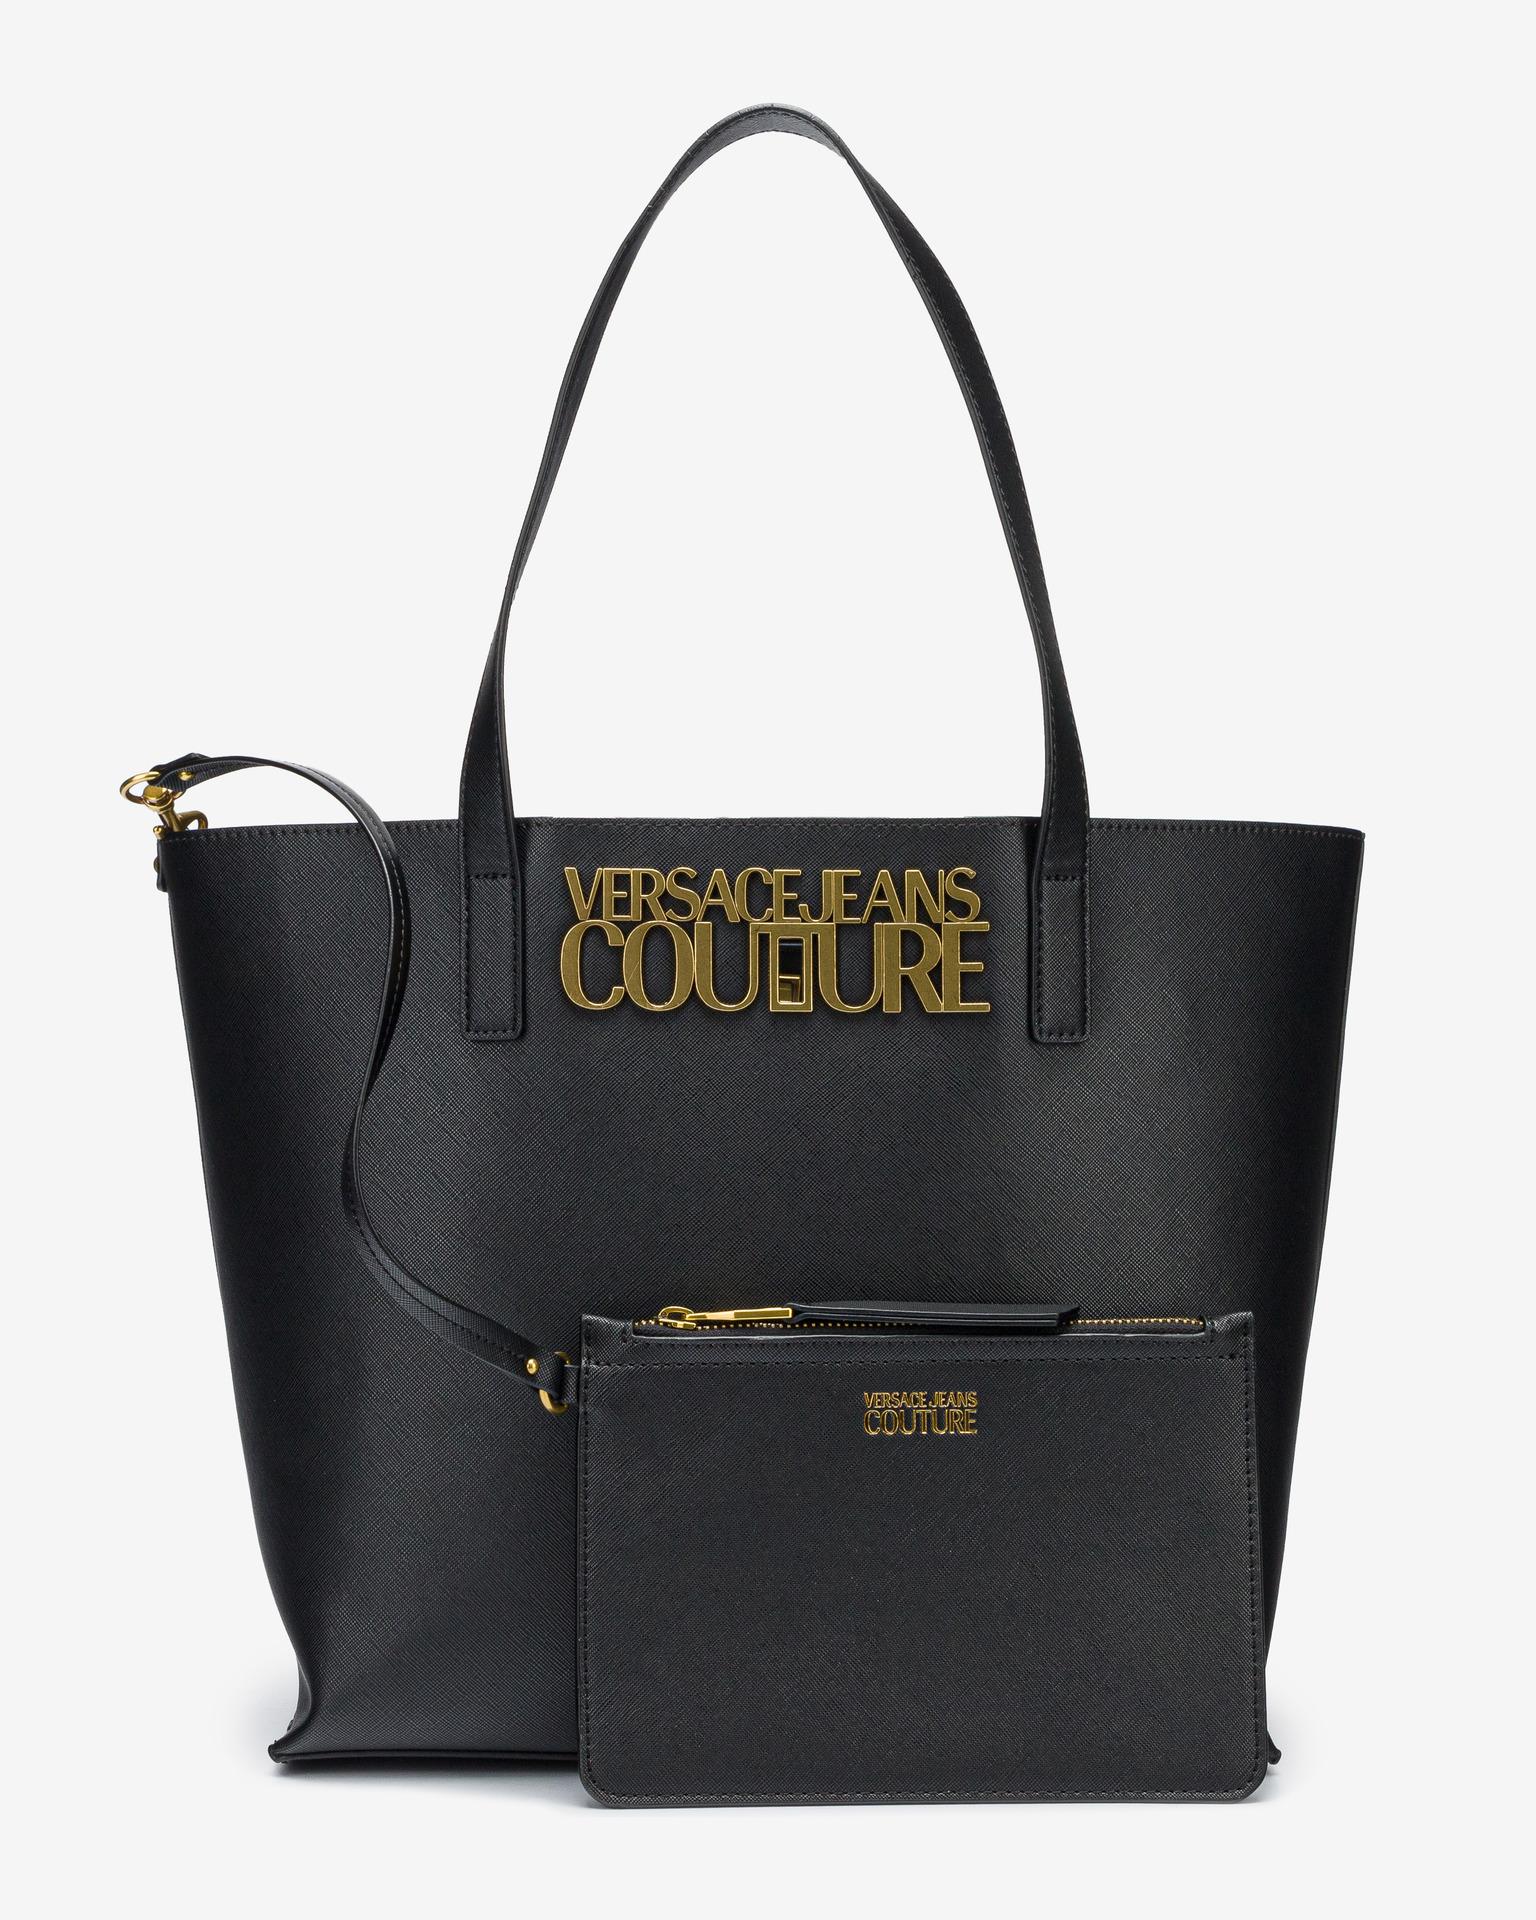 Versace Jeans Couture negre geanta